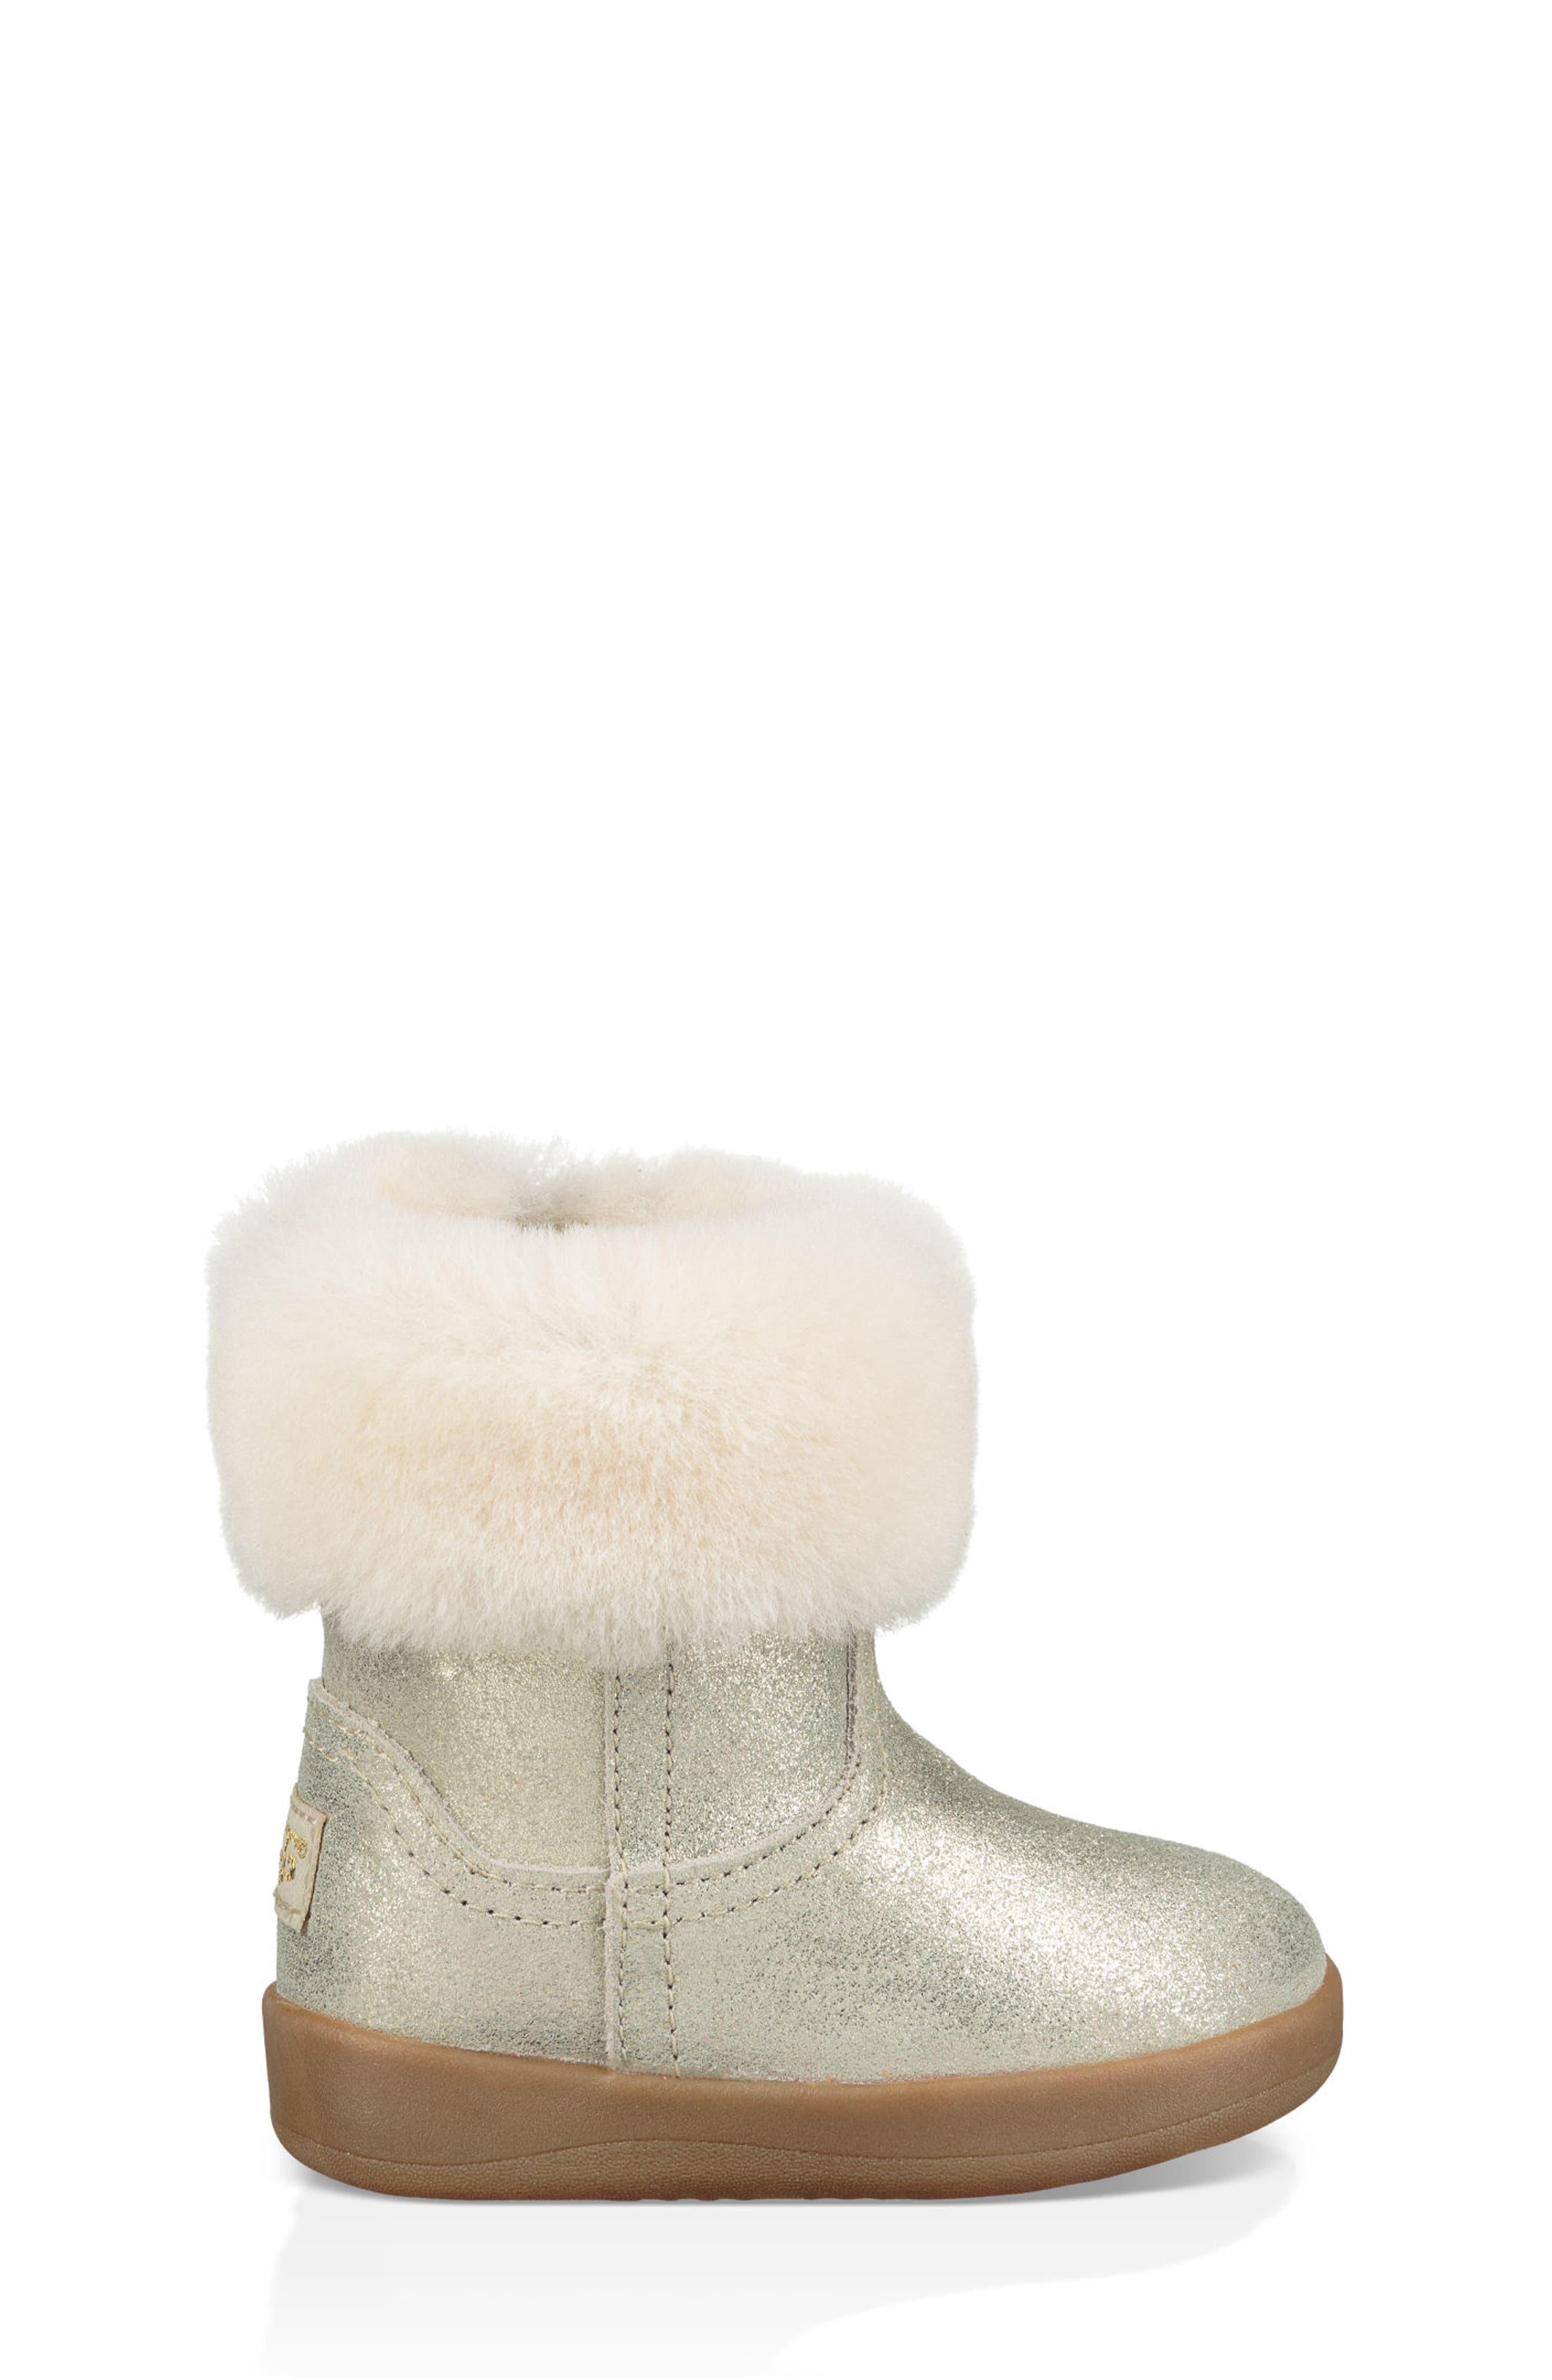 Jorie II Metallic Genuine Shearling Boot,                             Alternate thumbnail 3, color,                             GOLD